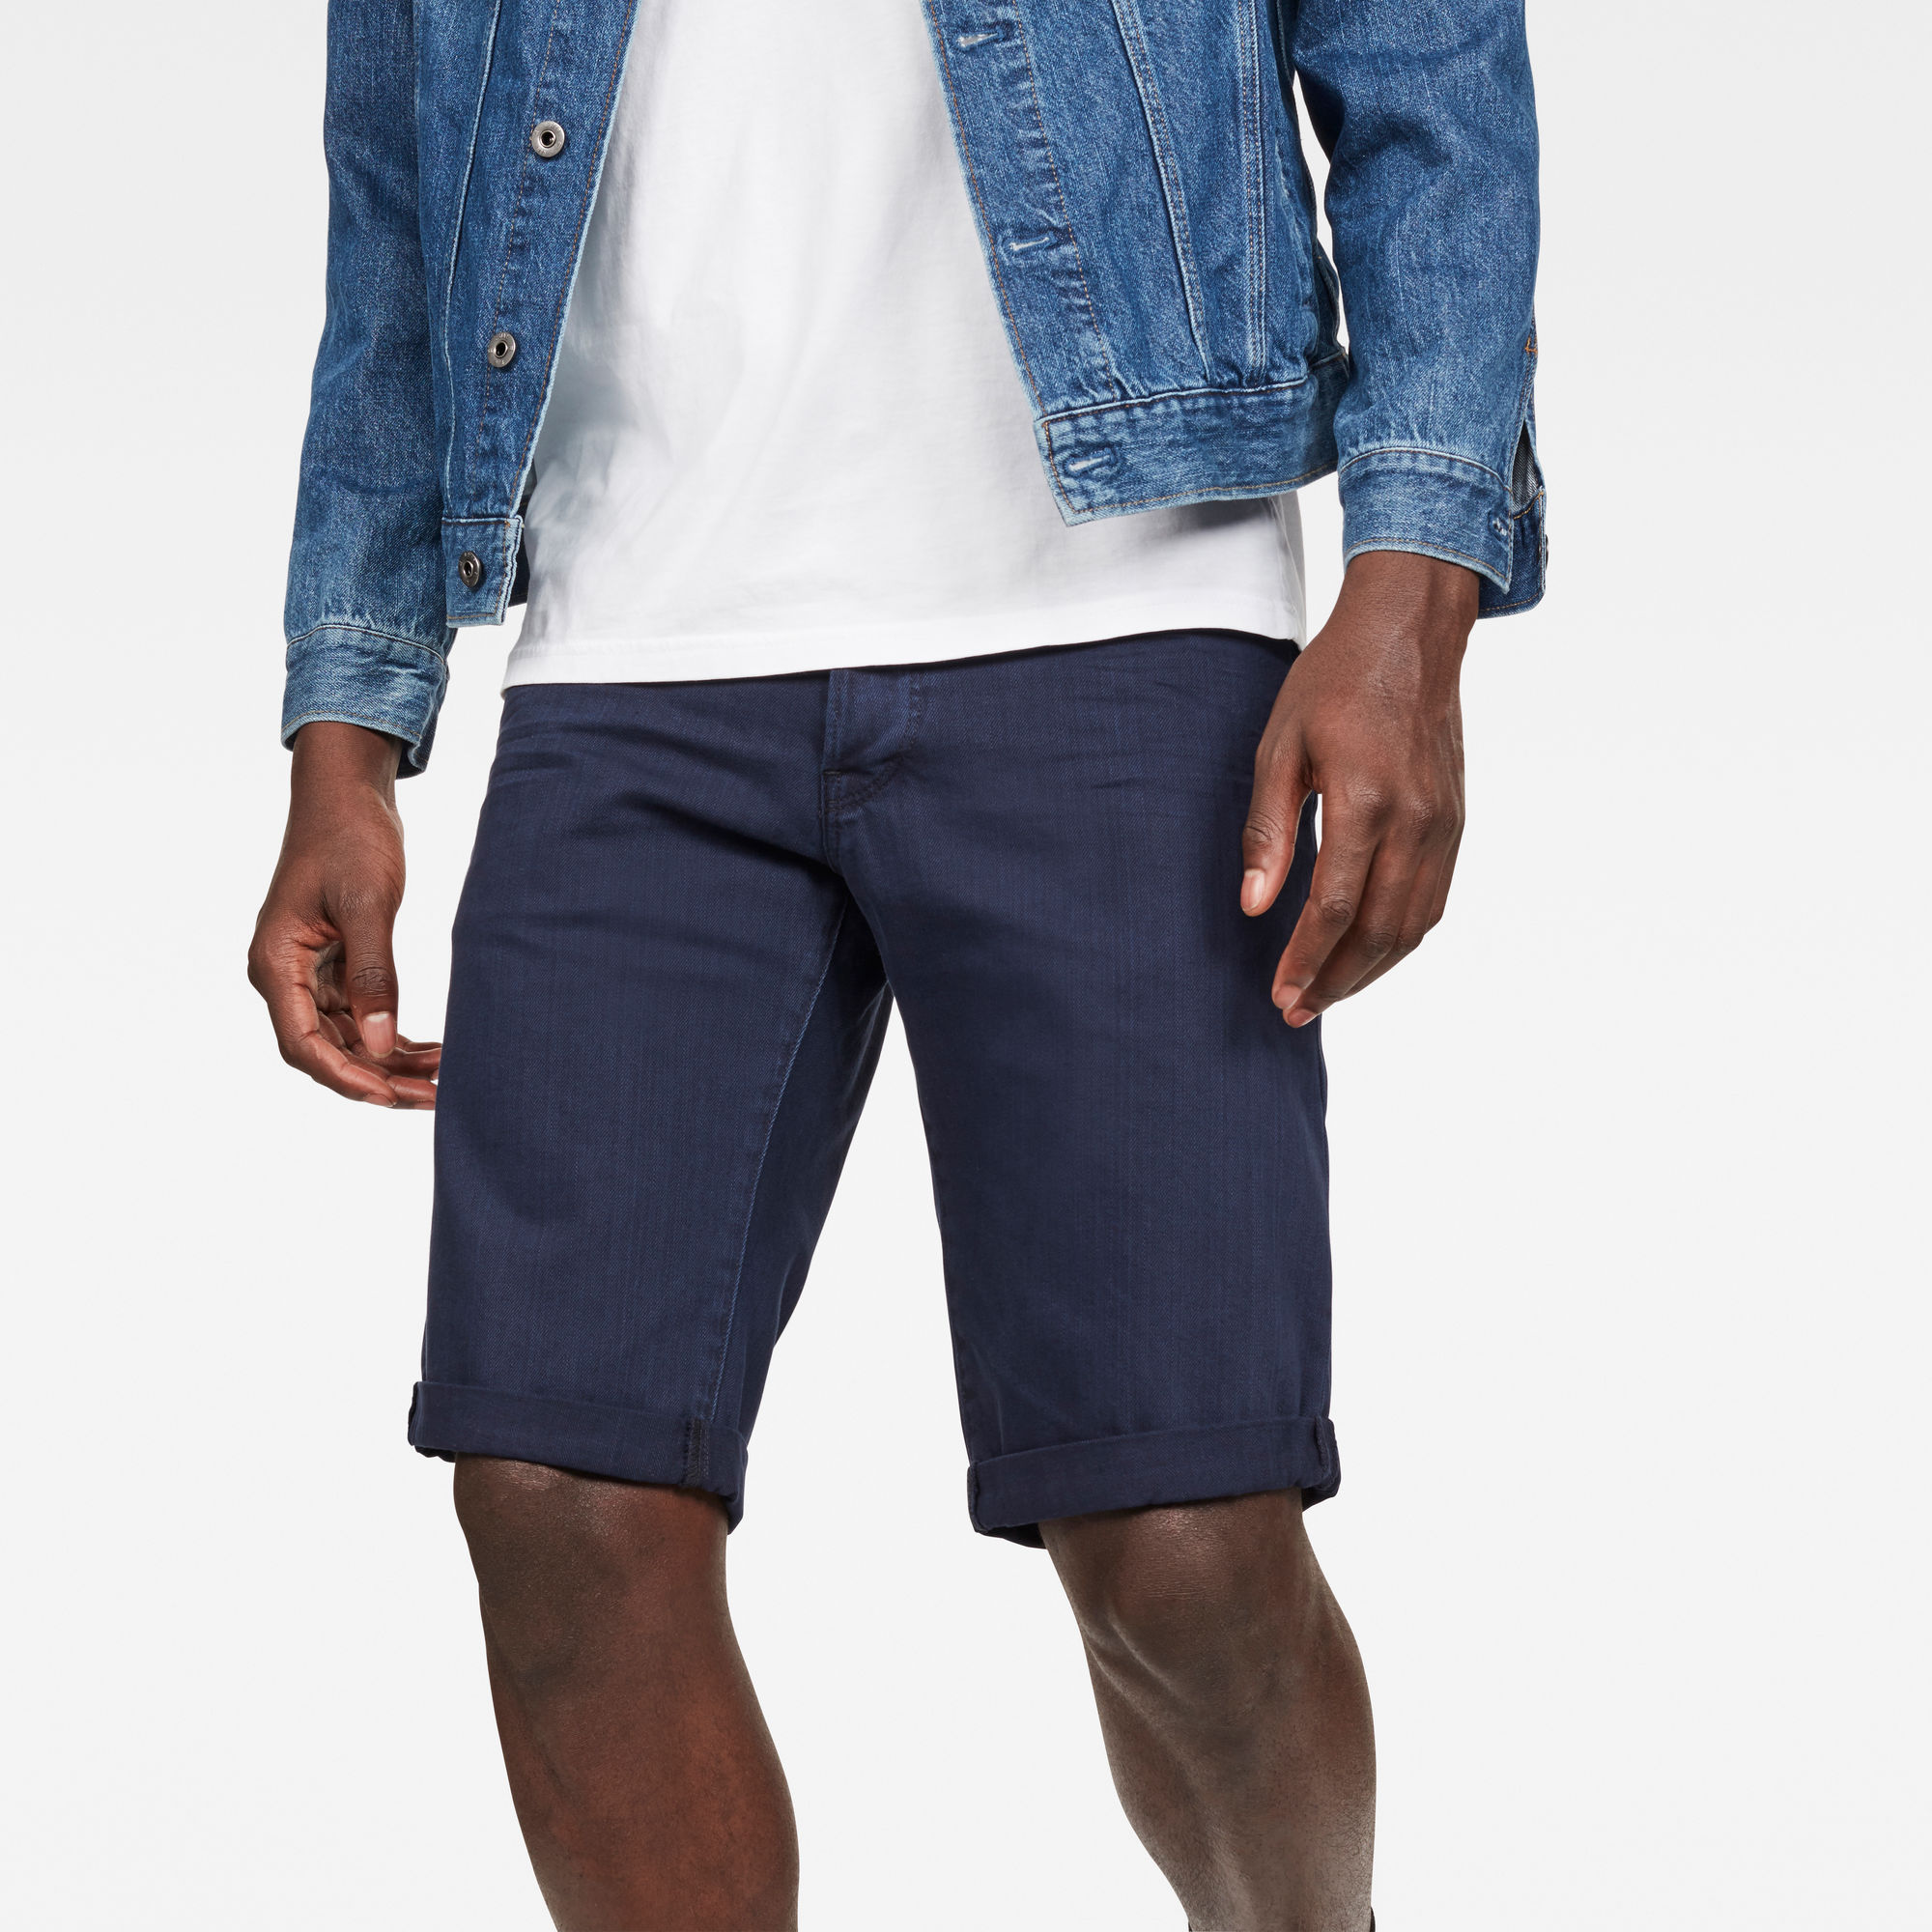 Image of G Star Raw 3301 1\2 Shorts